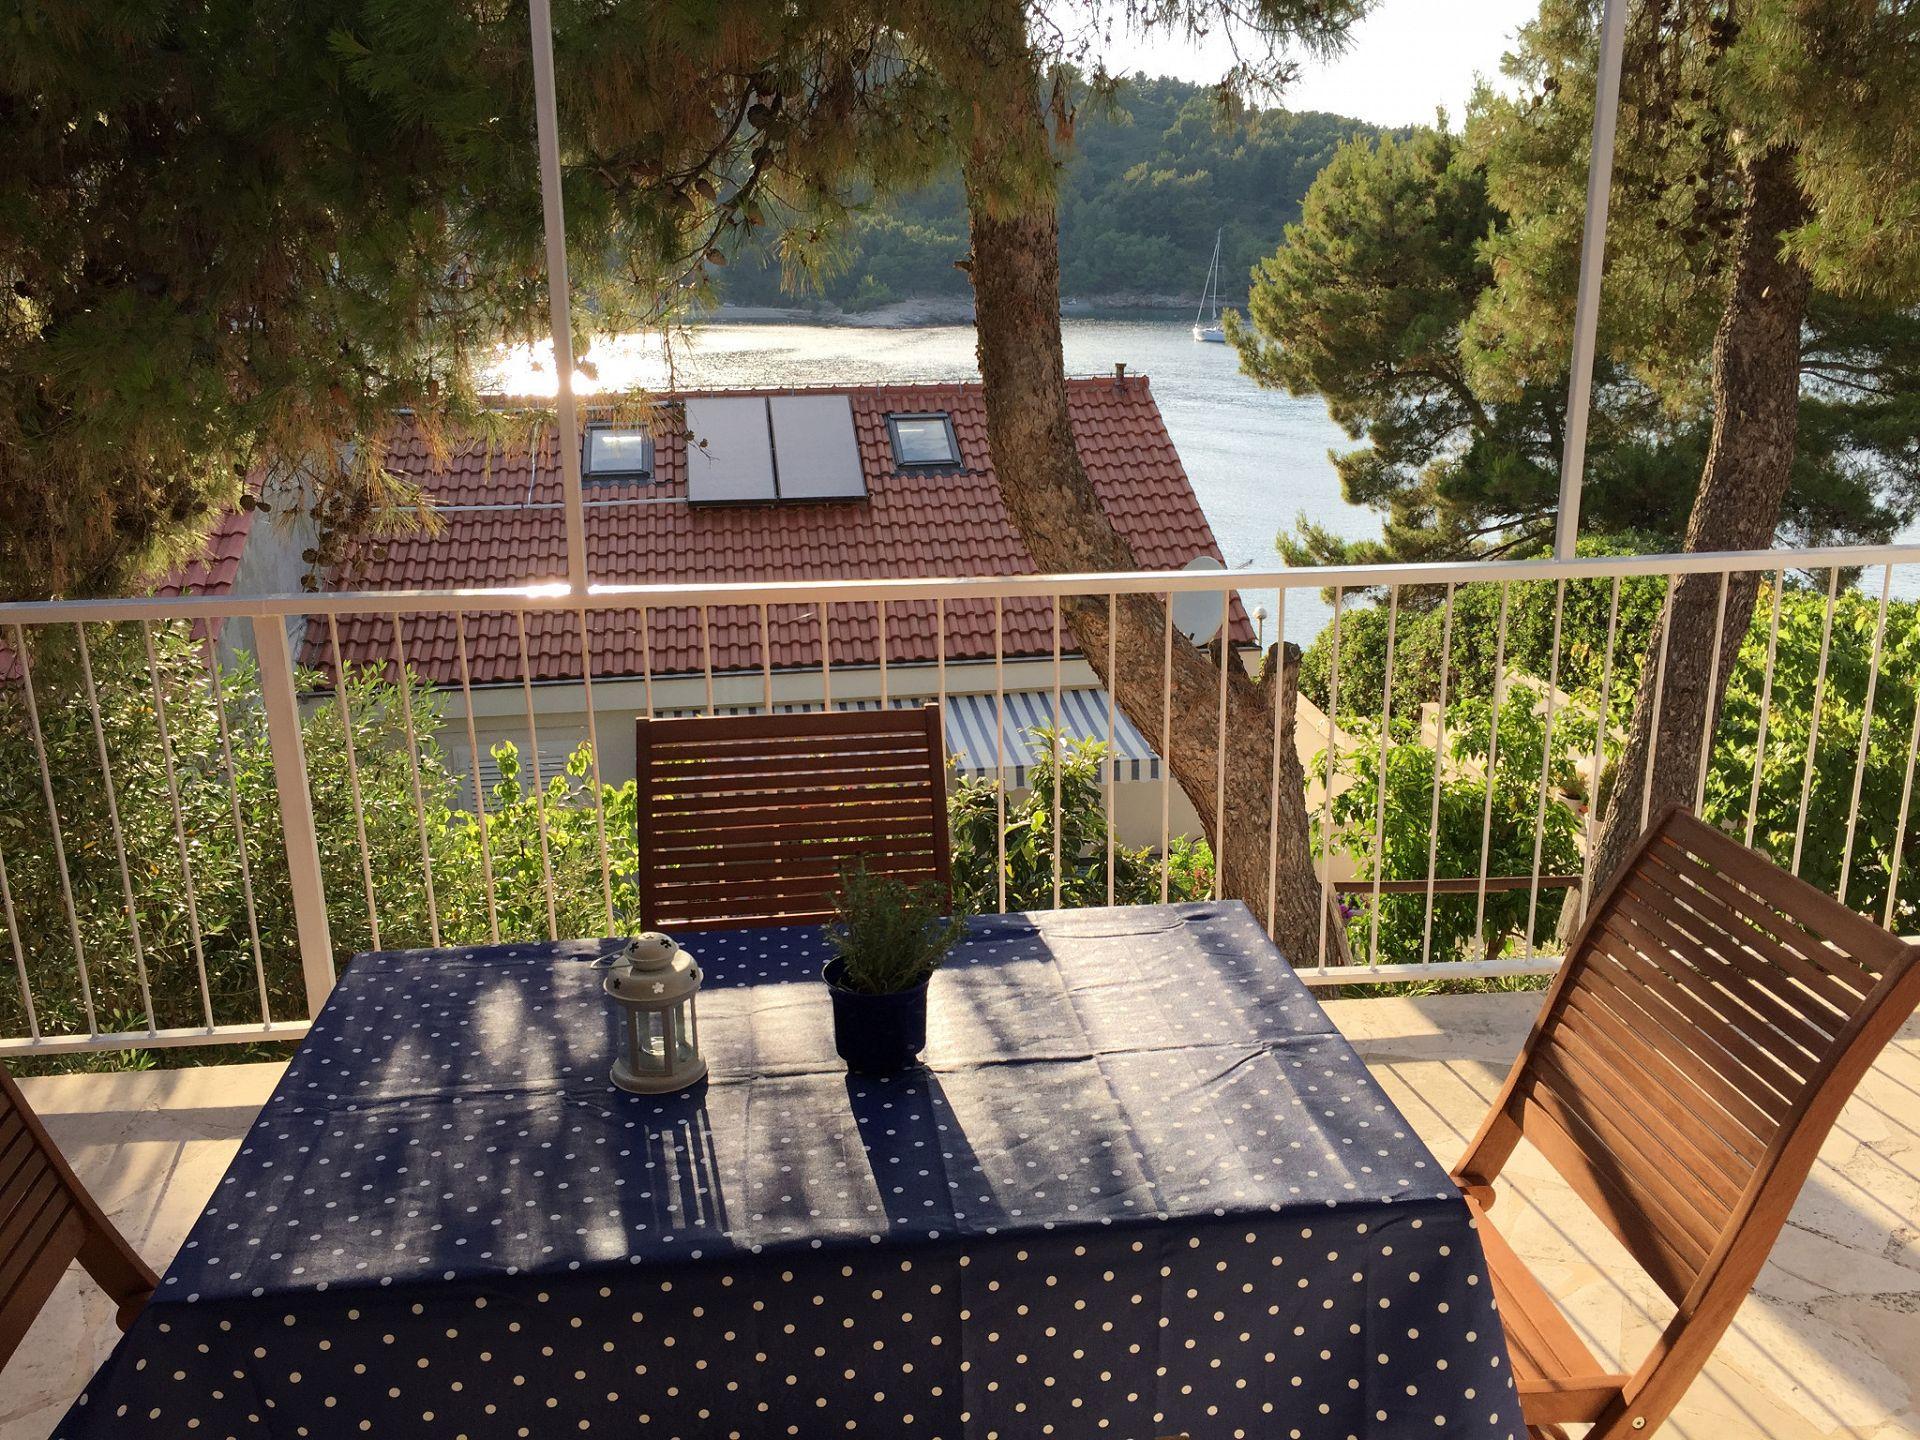 Vanesa - Stomorska - Vakantiehuizen, villa´s Kroatië